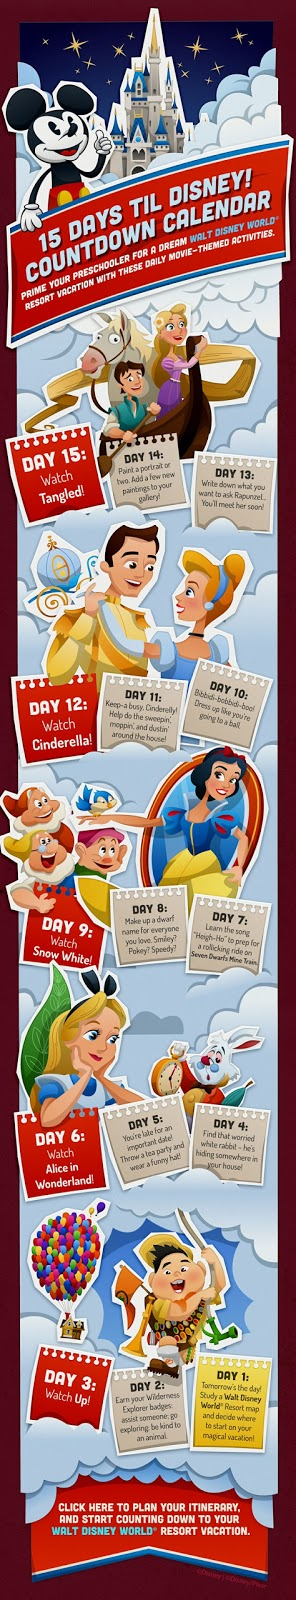 15 Day Disney Countdown